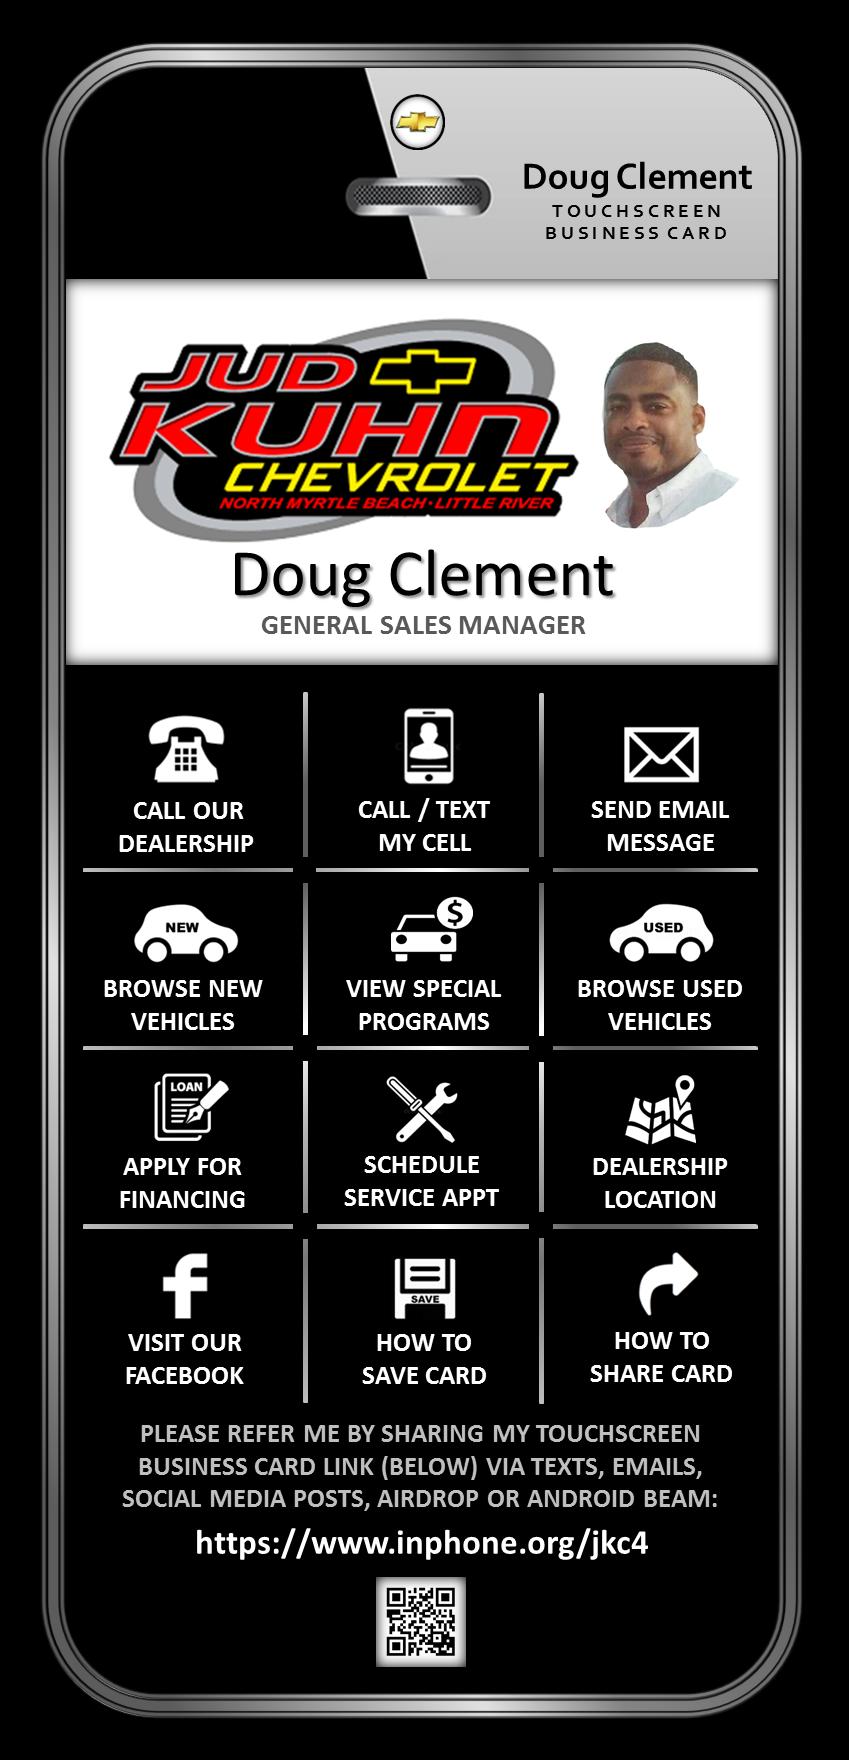 jud kuhn1 - Doug Clement.png